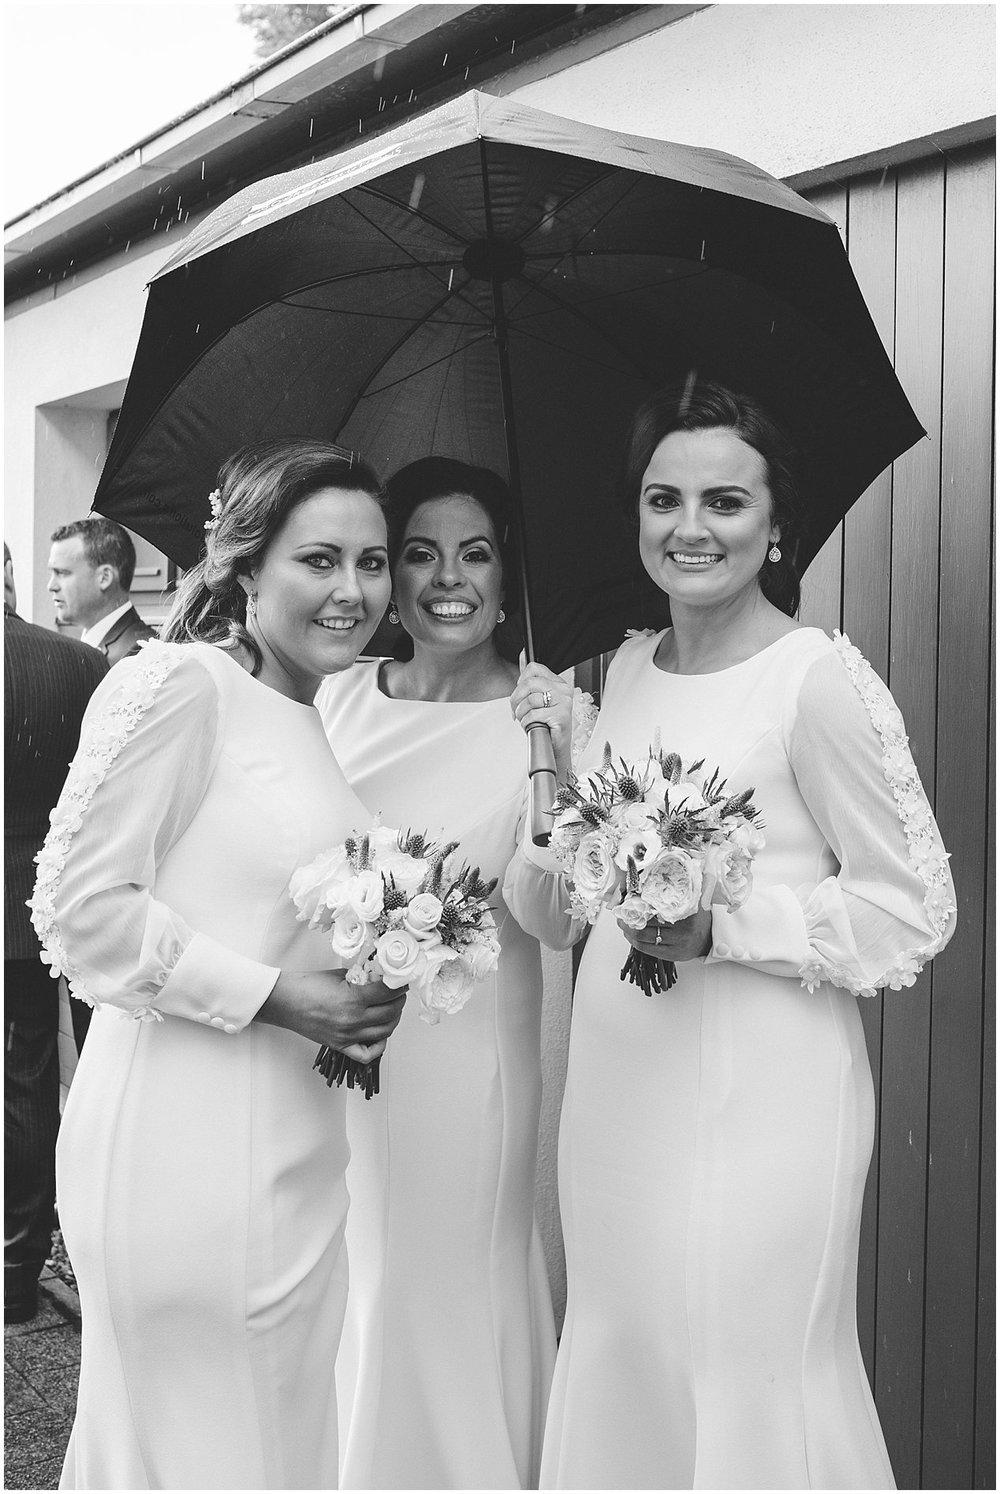 Shauneen_PJ_Hillgrove_Hotel_Monaghan_Wedding_jude_browne_photography_0046.jpg